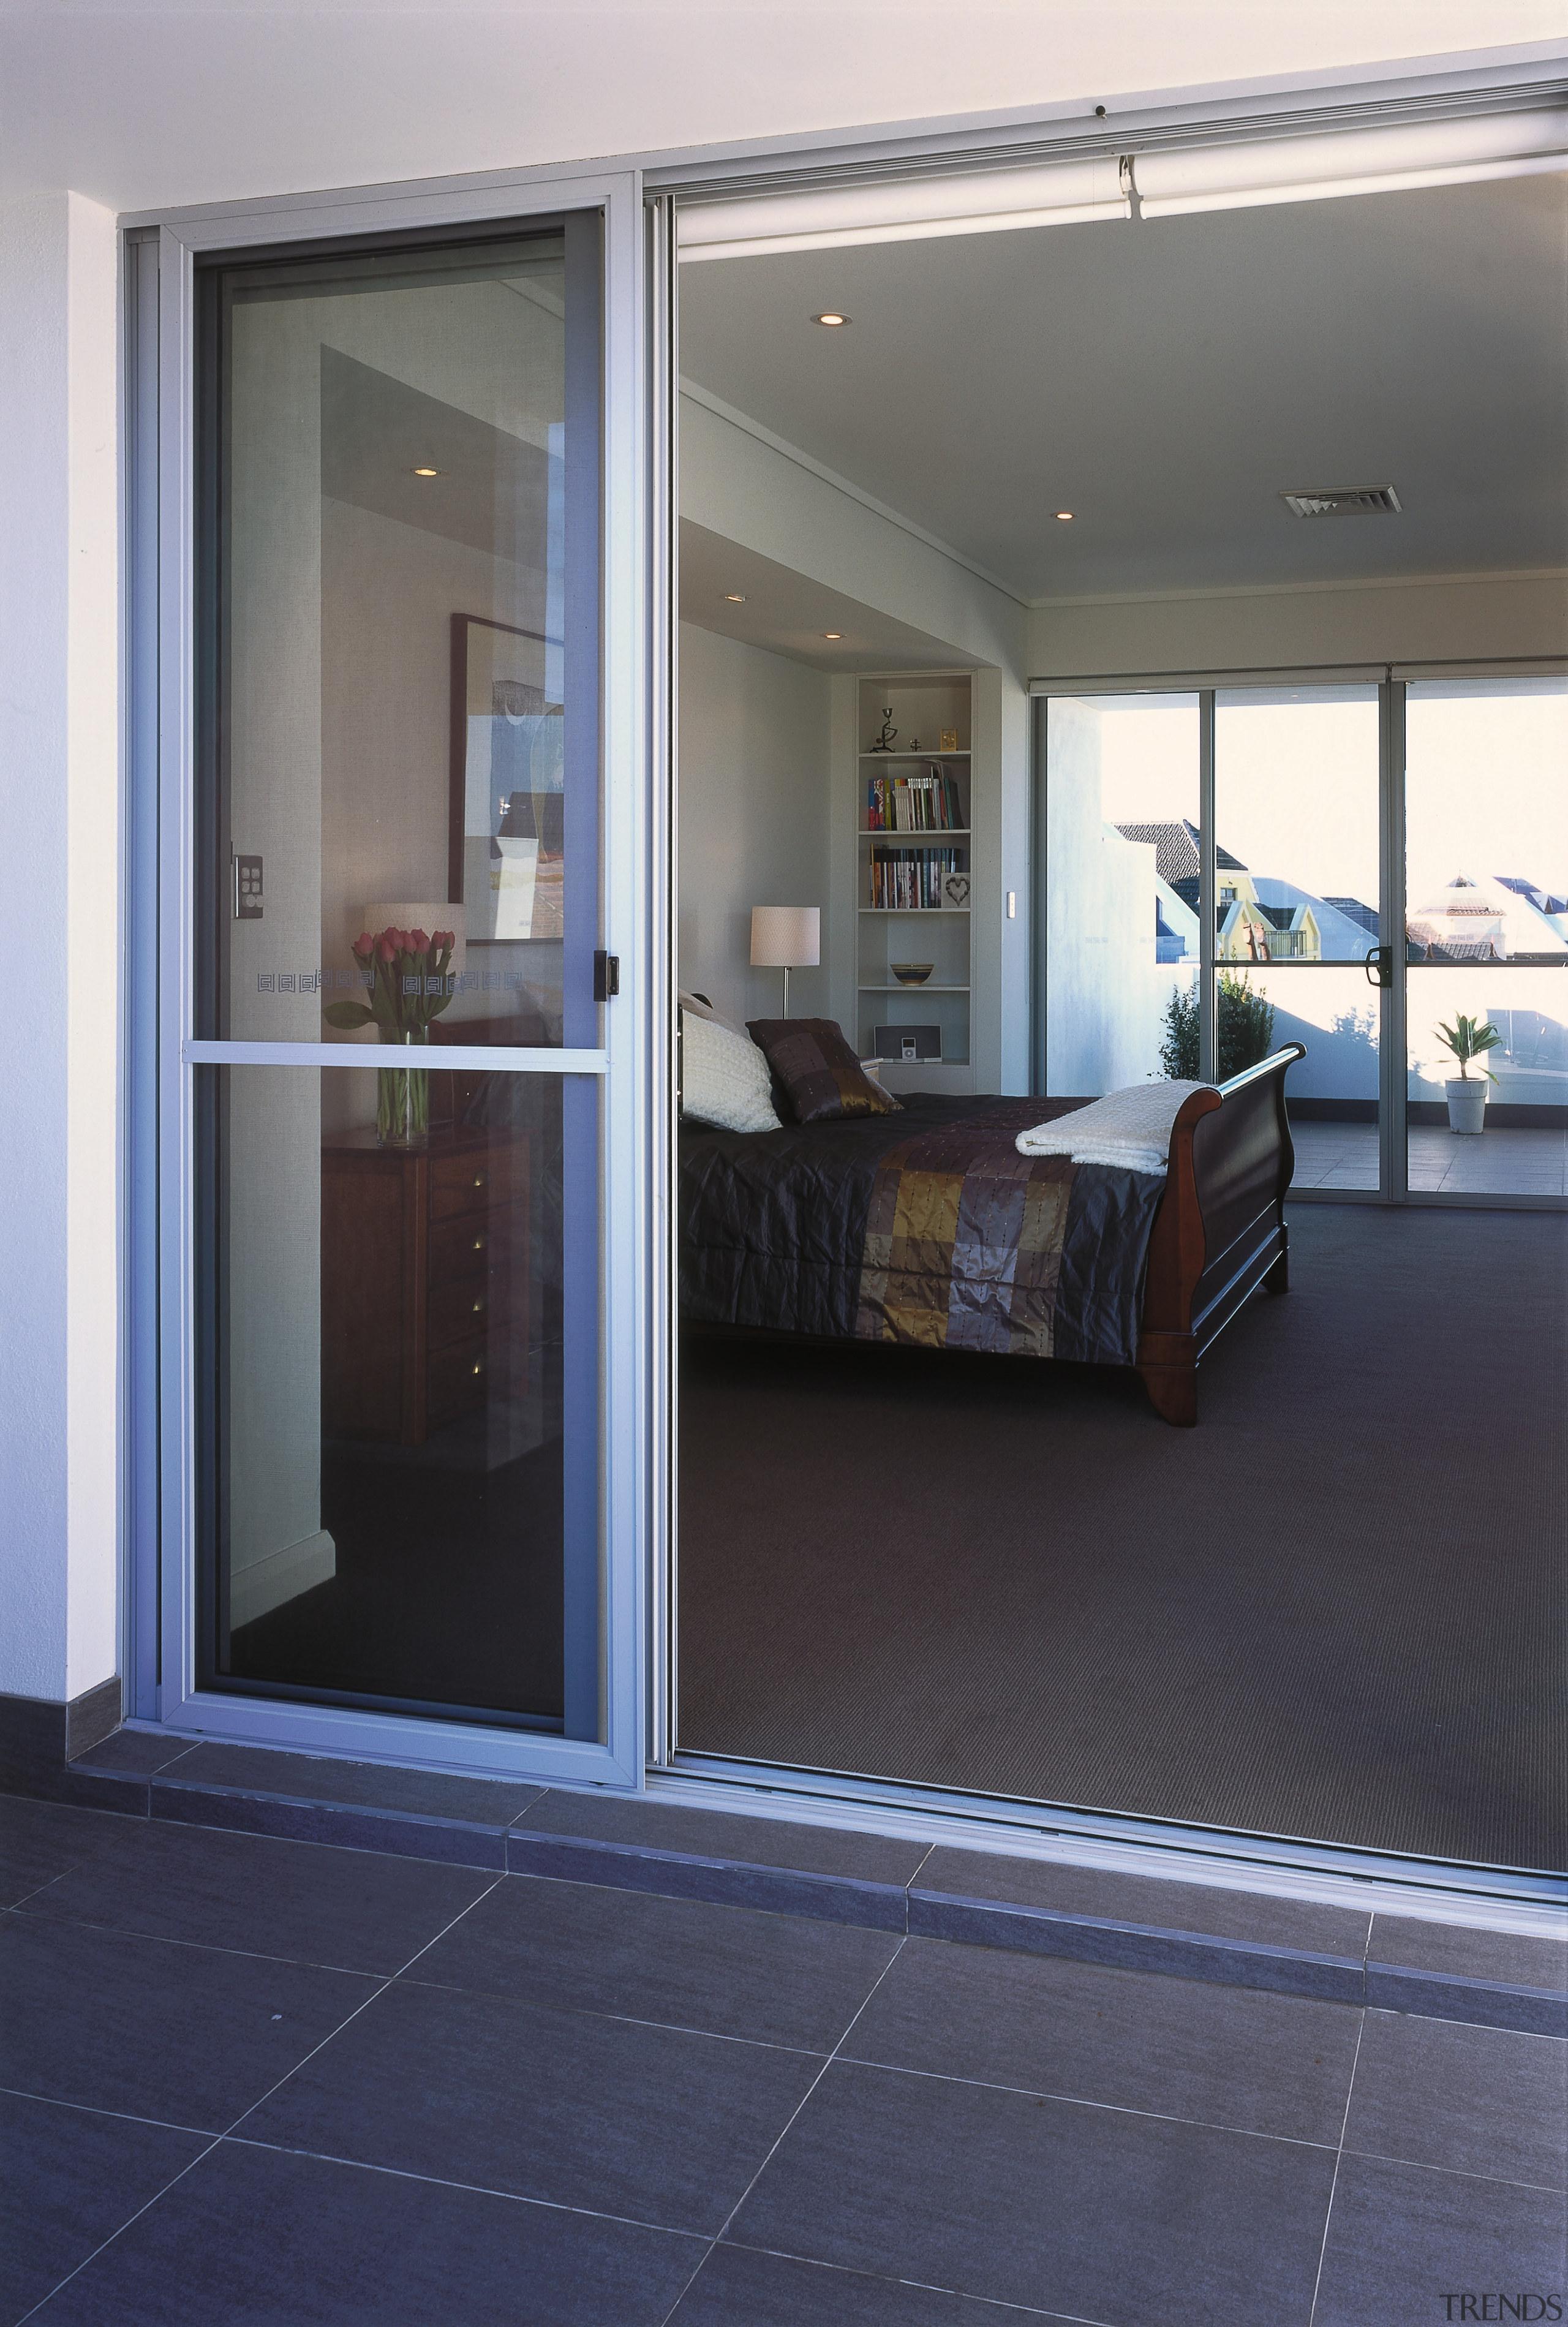 A view of the patio area. - A door, floor, flooring, glass, real estate, window, gray